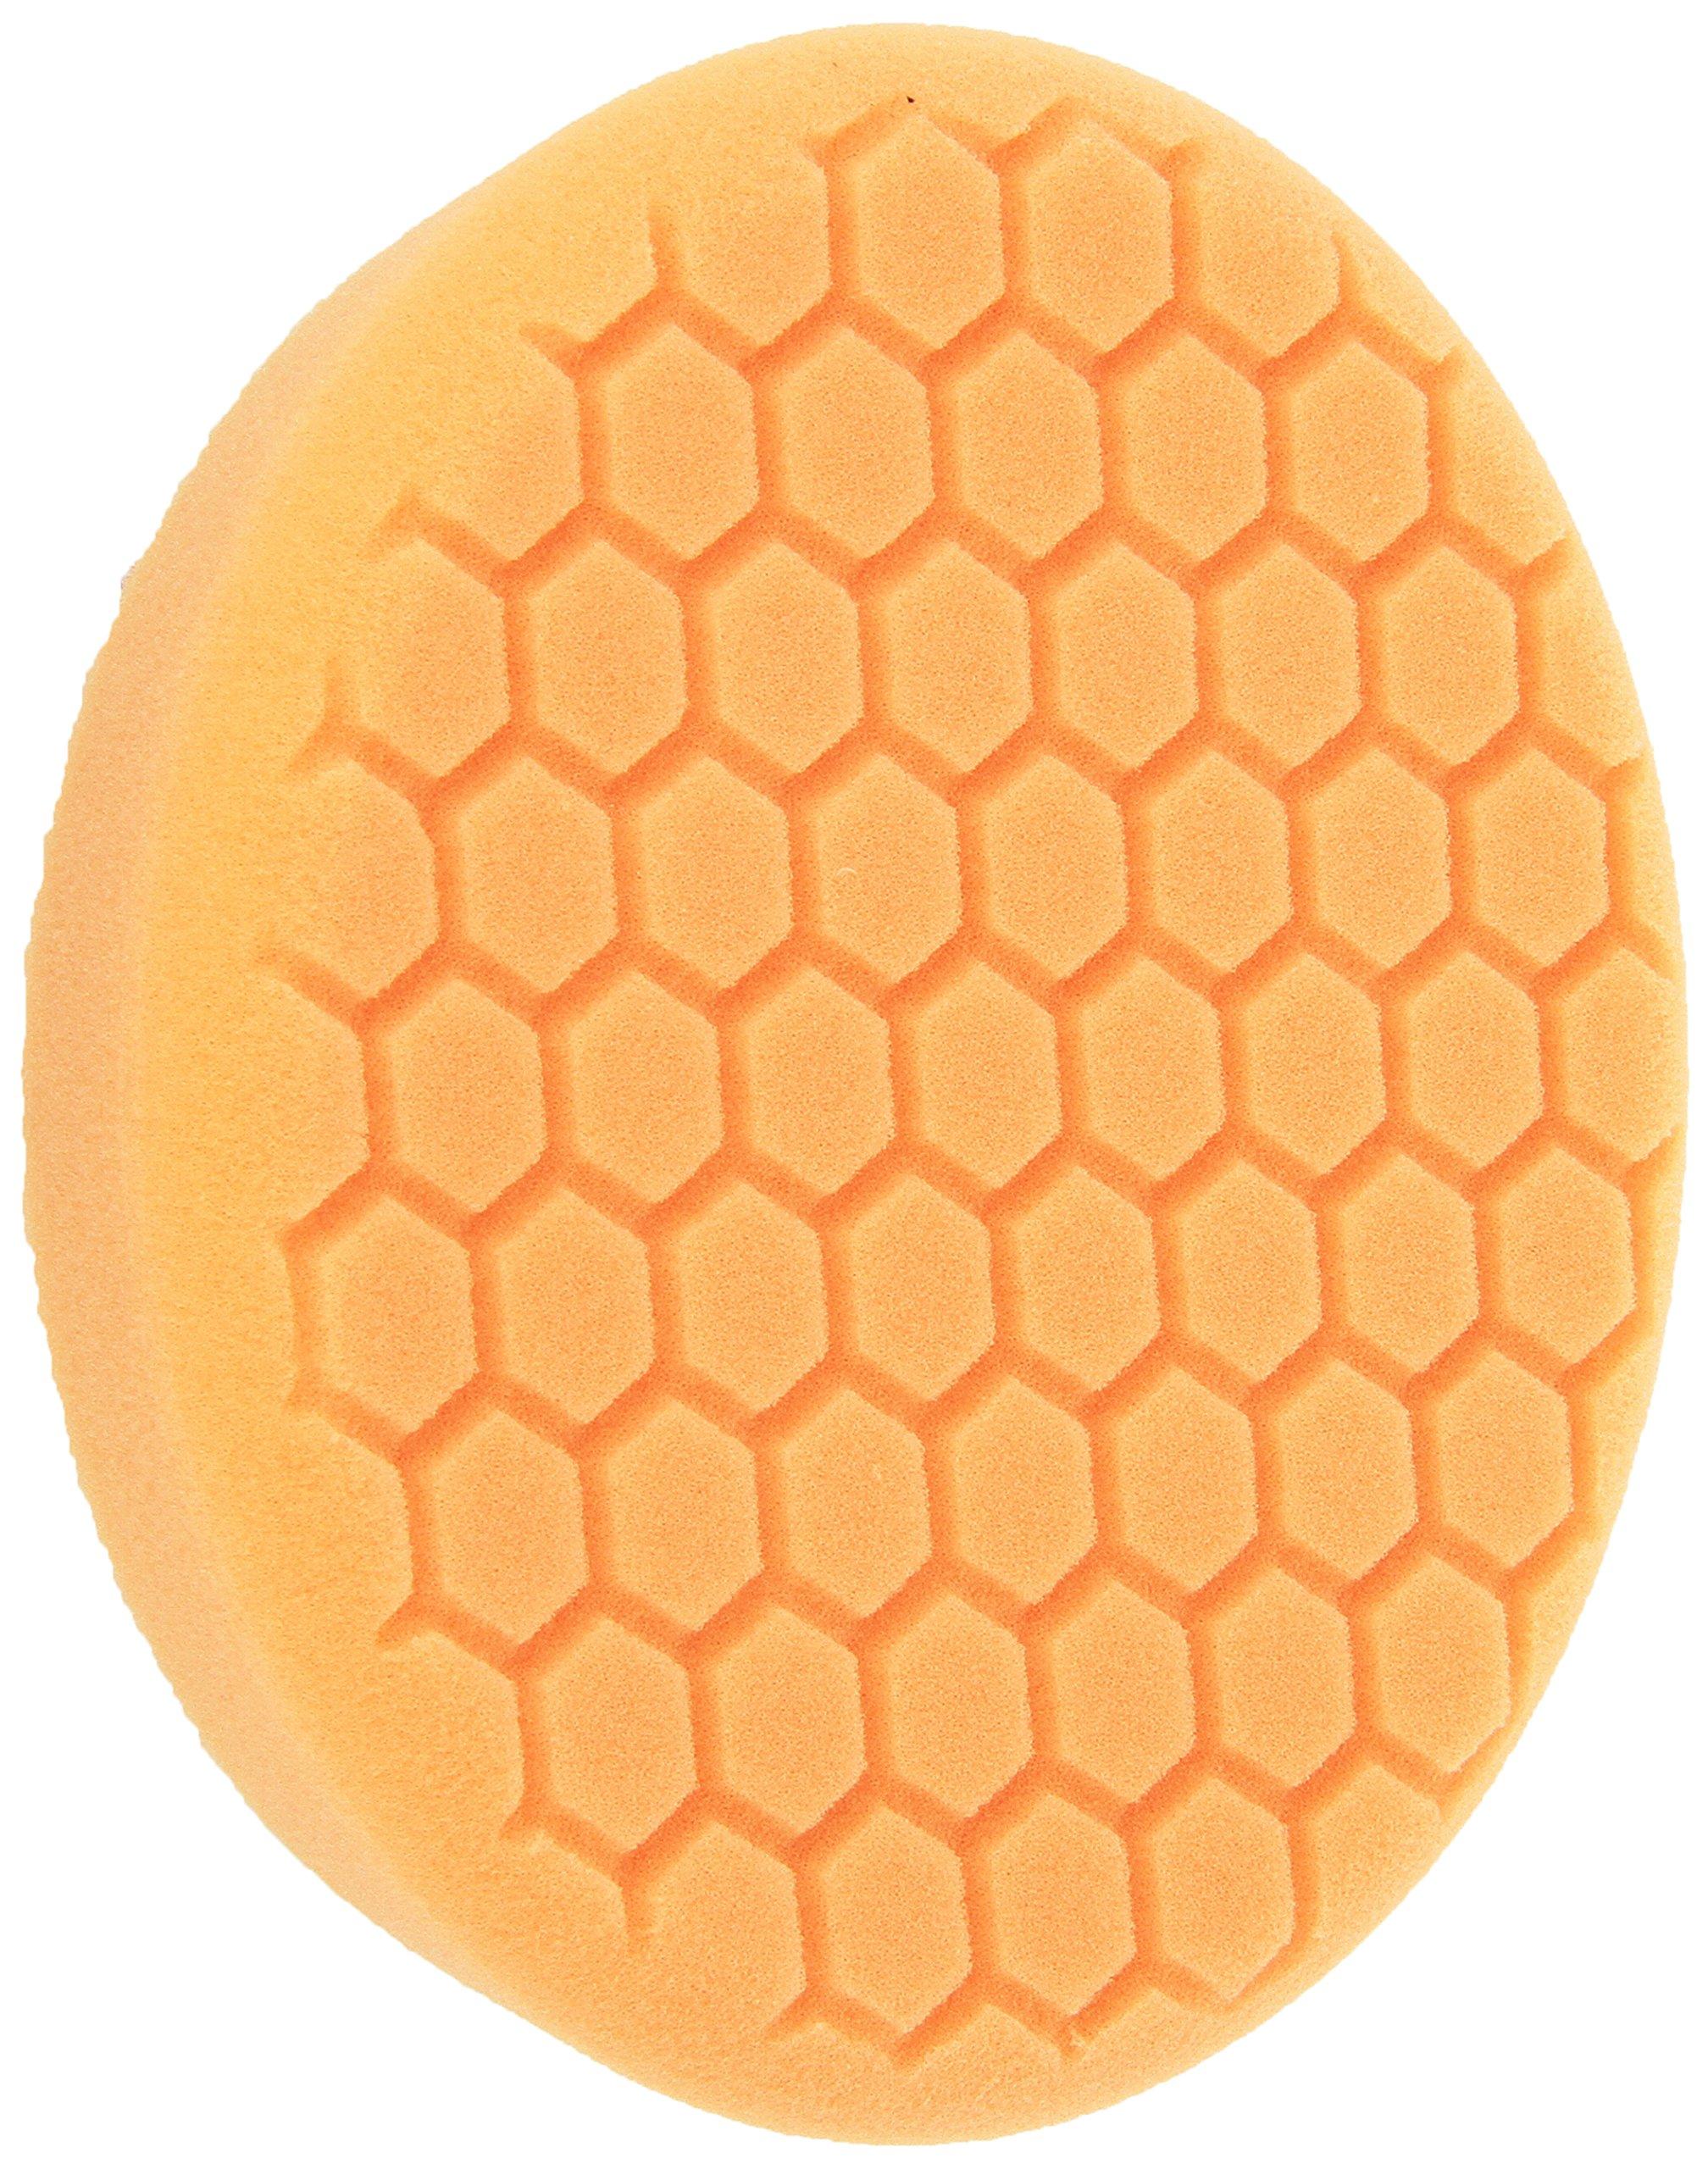 Chemical Guys BUFX_102_HEX Self-Centered Hex-Logic Medium-Heavy Cut Scratch and Swirl Remover, Orange (7.5 Inch)